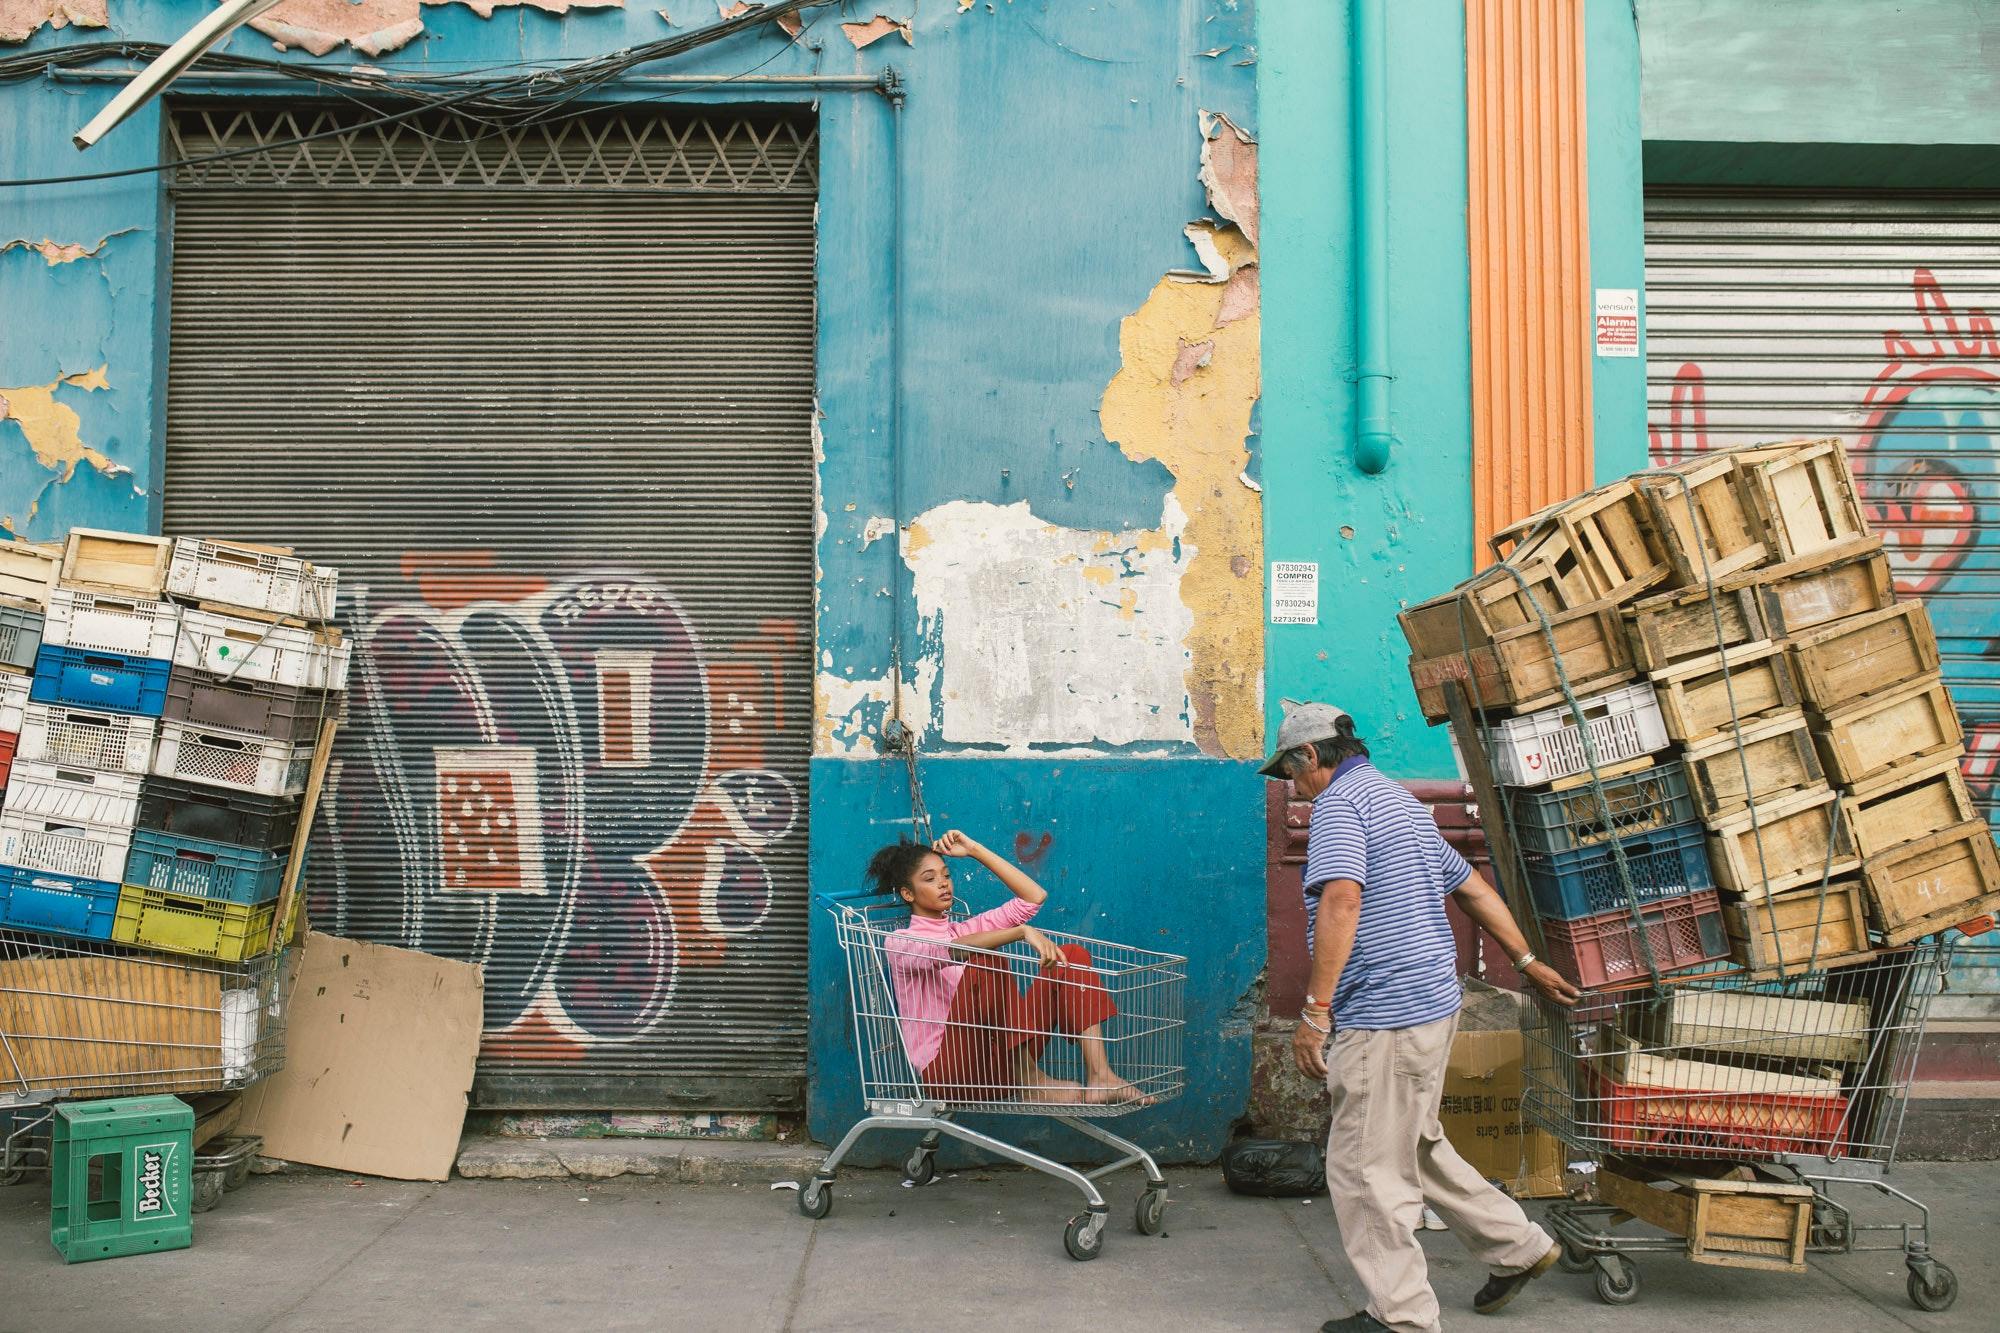 Man wearing gray cap and blue shirt holding shopping cart photo